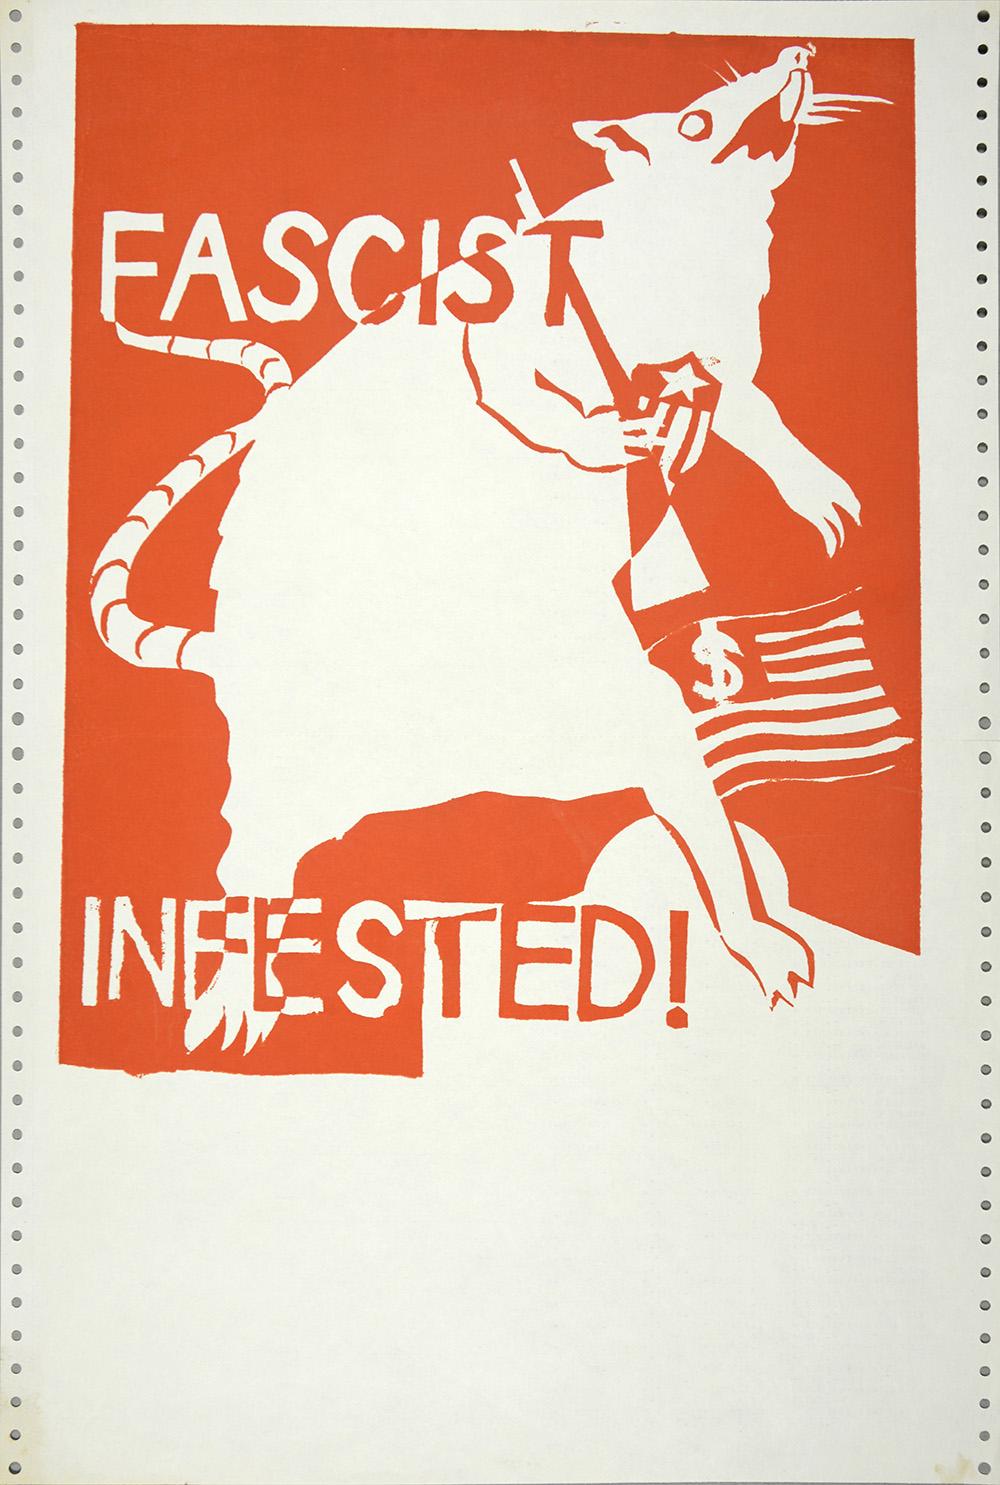 Fascist Infested!, 1970. Courtesy Shapero Modern.